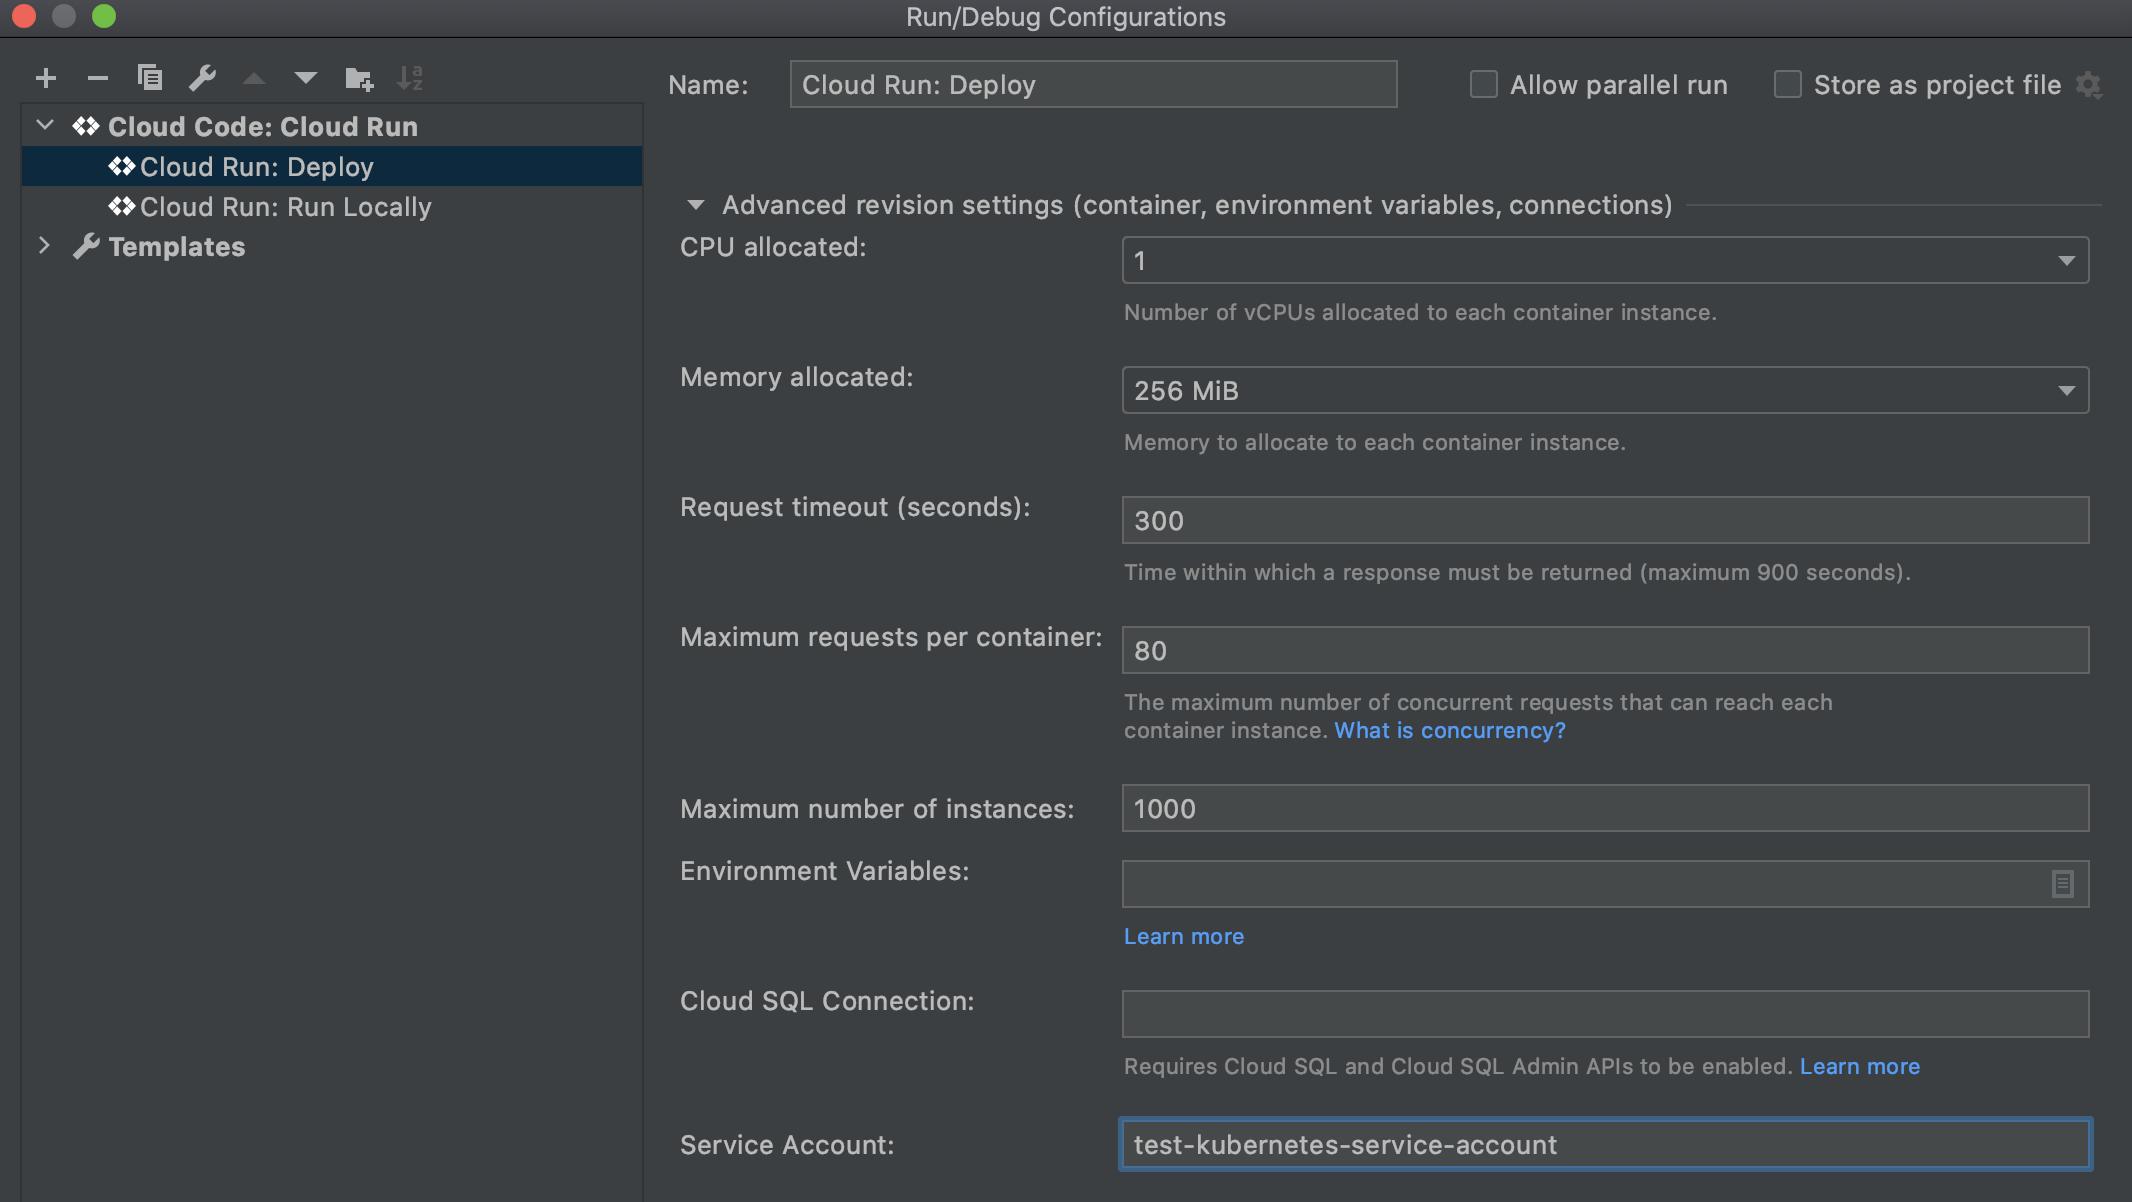 Cloud Run에서 펼쳐진 고급 버전 설정 섹션: Kubernetes 서비스 계정 이름으로 채워진 배포 및 서비스 계정 필드